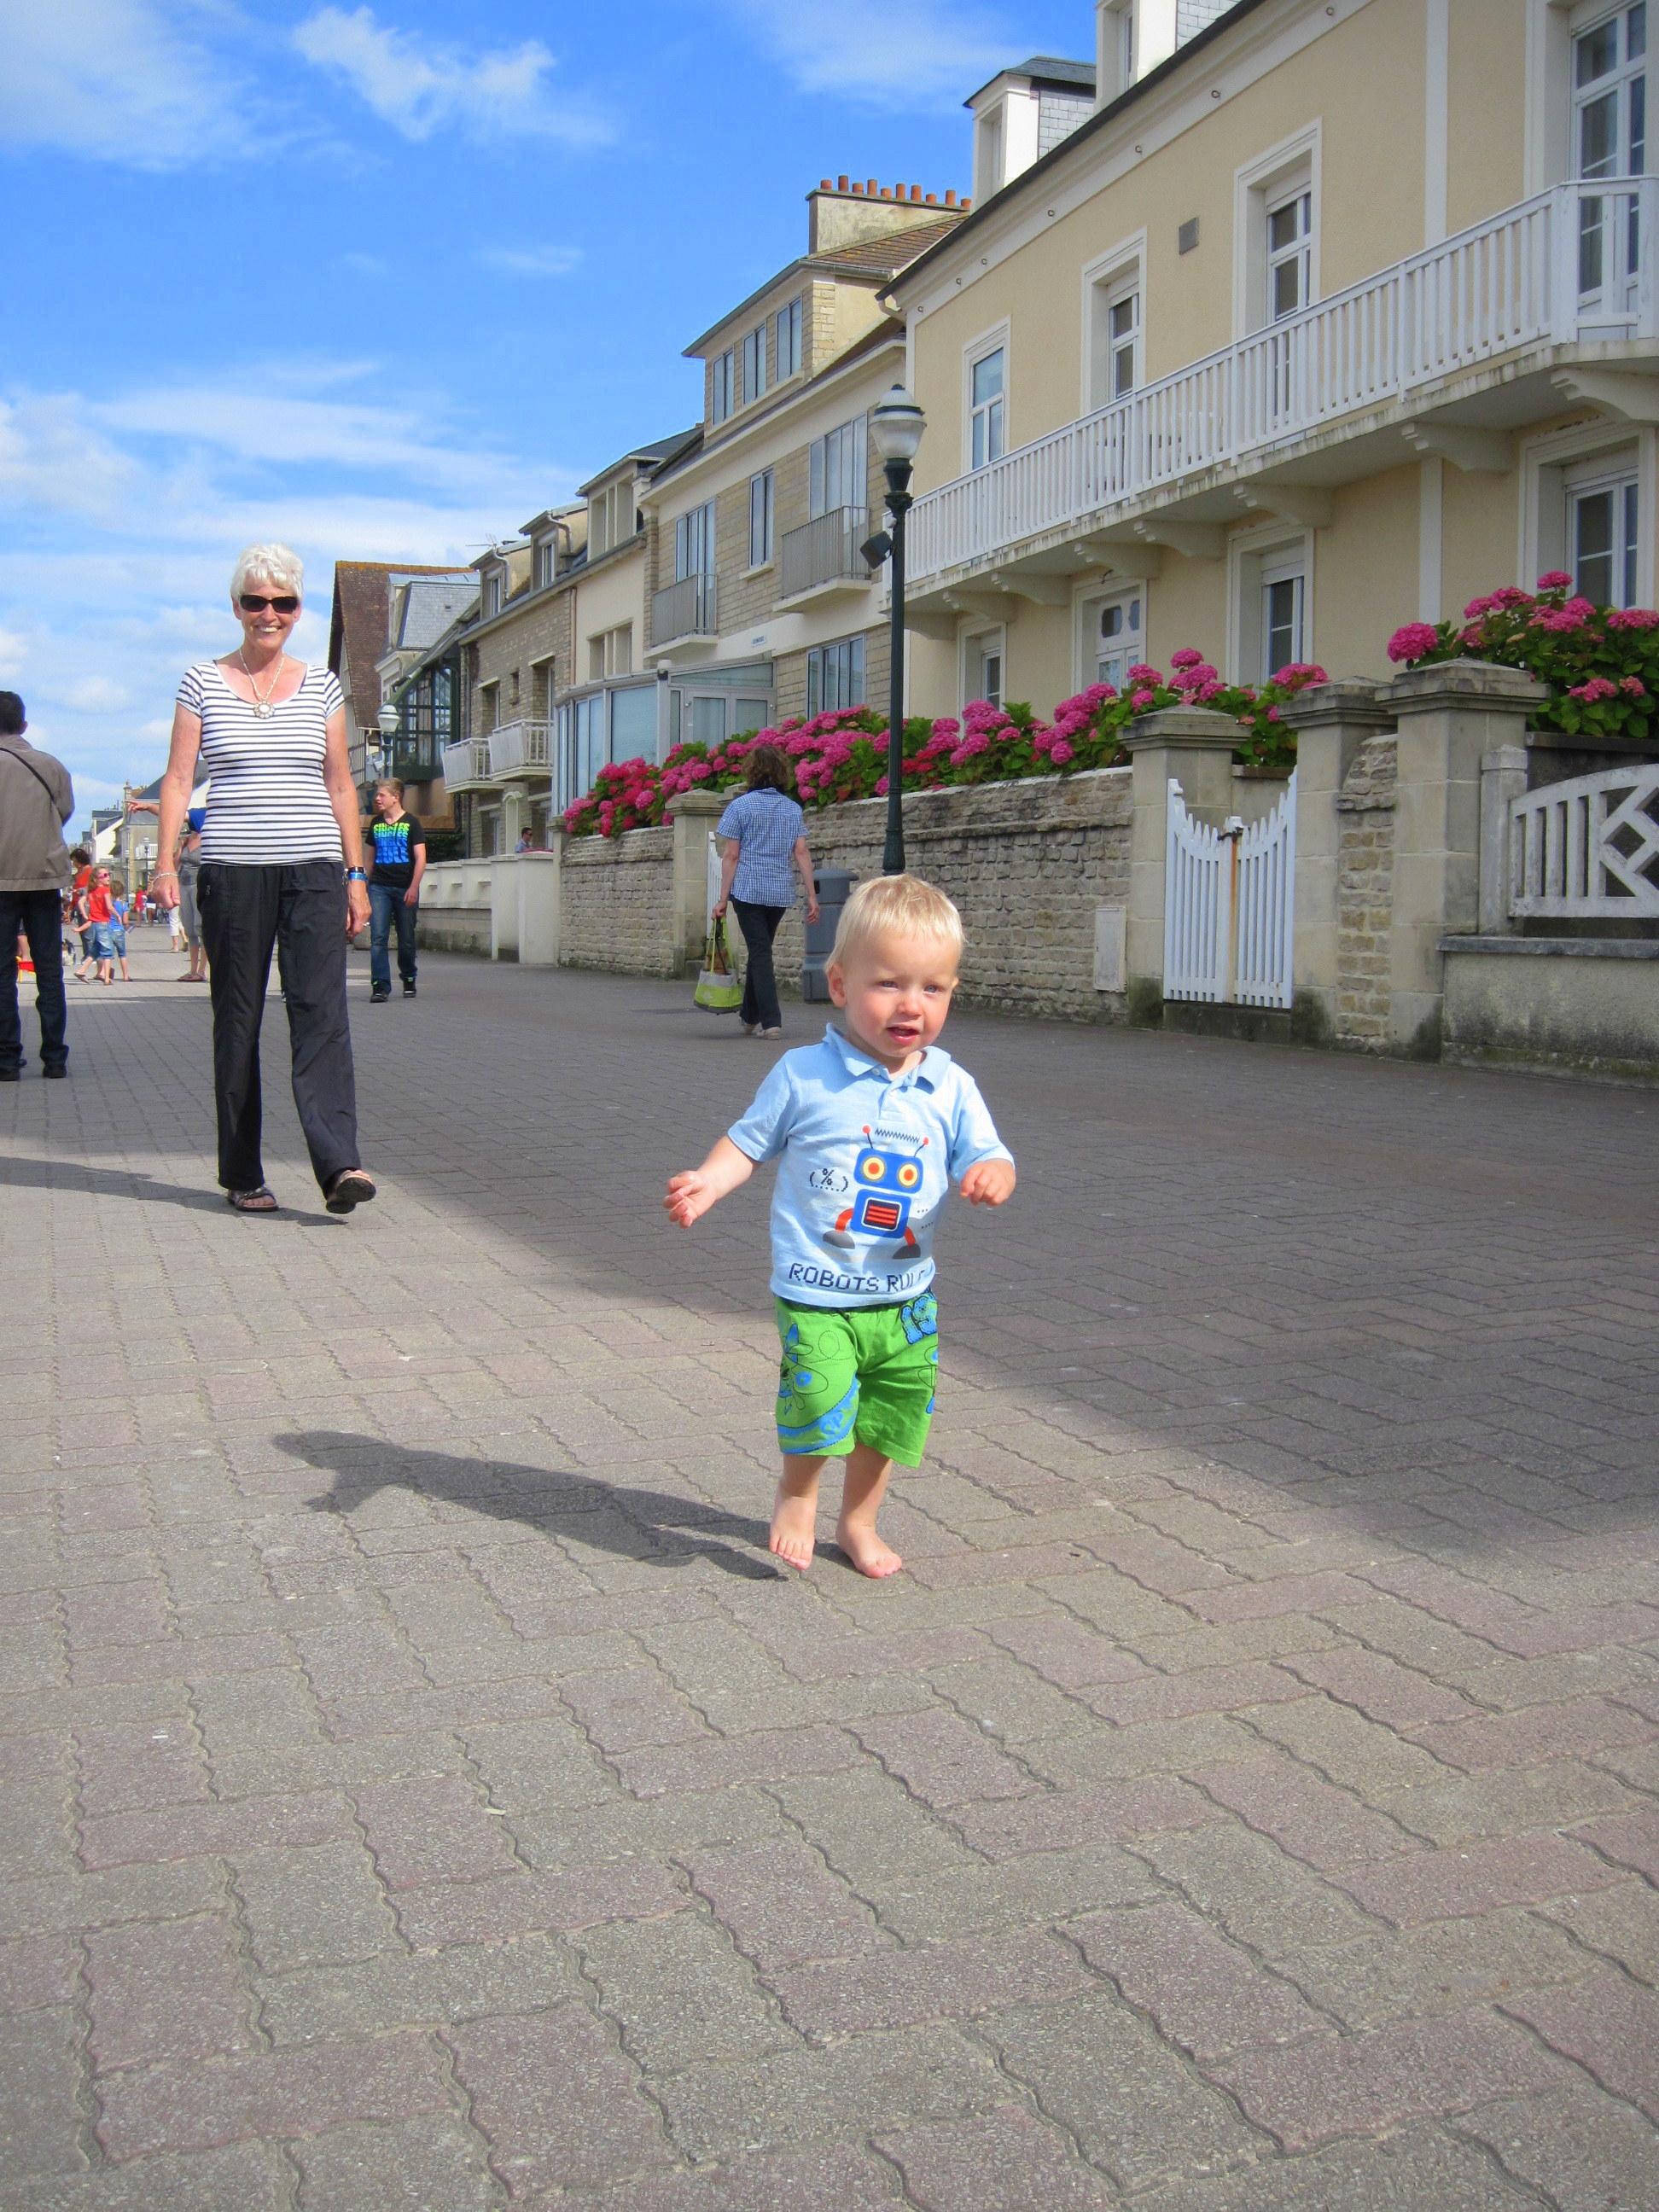 Pastel villas along the promenade in Saint Aubin sur Mer. (Mo has just two settings, run or sit.)